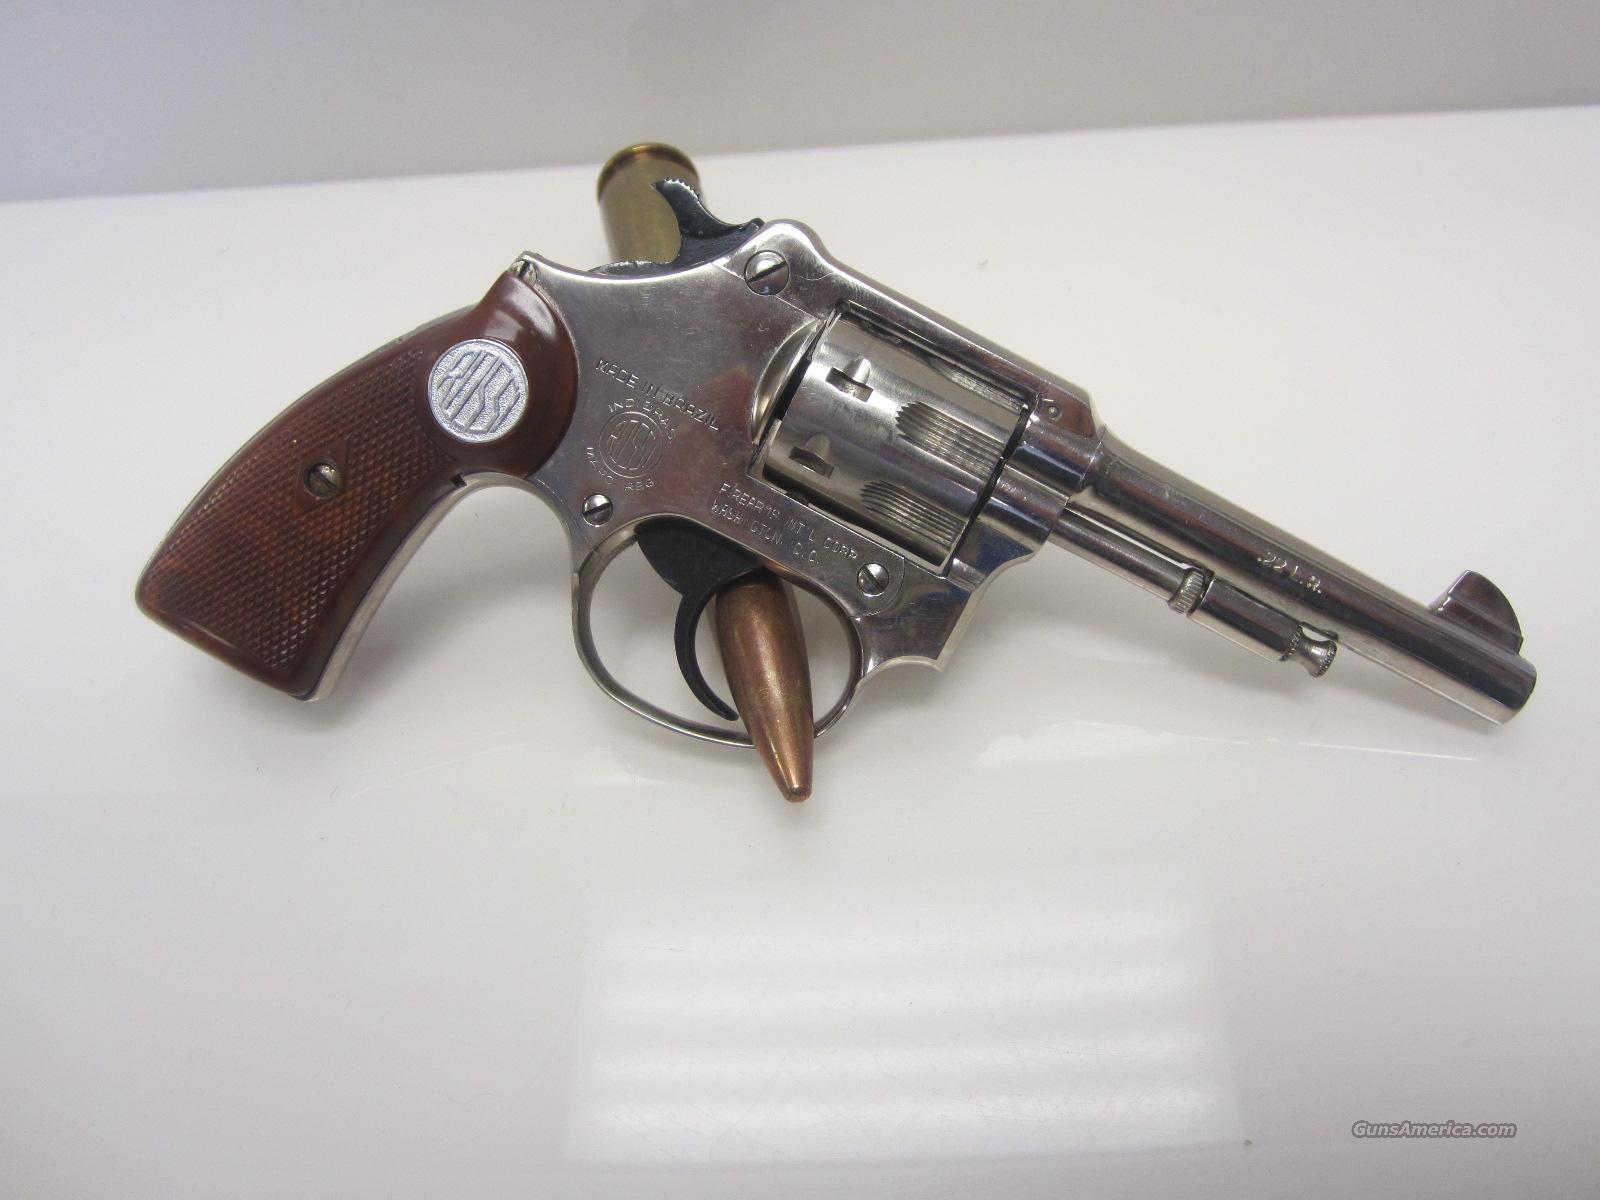 Rossi Princess 22LR Revolver Model 13